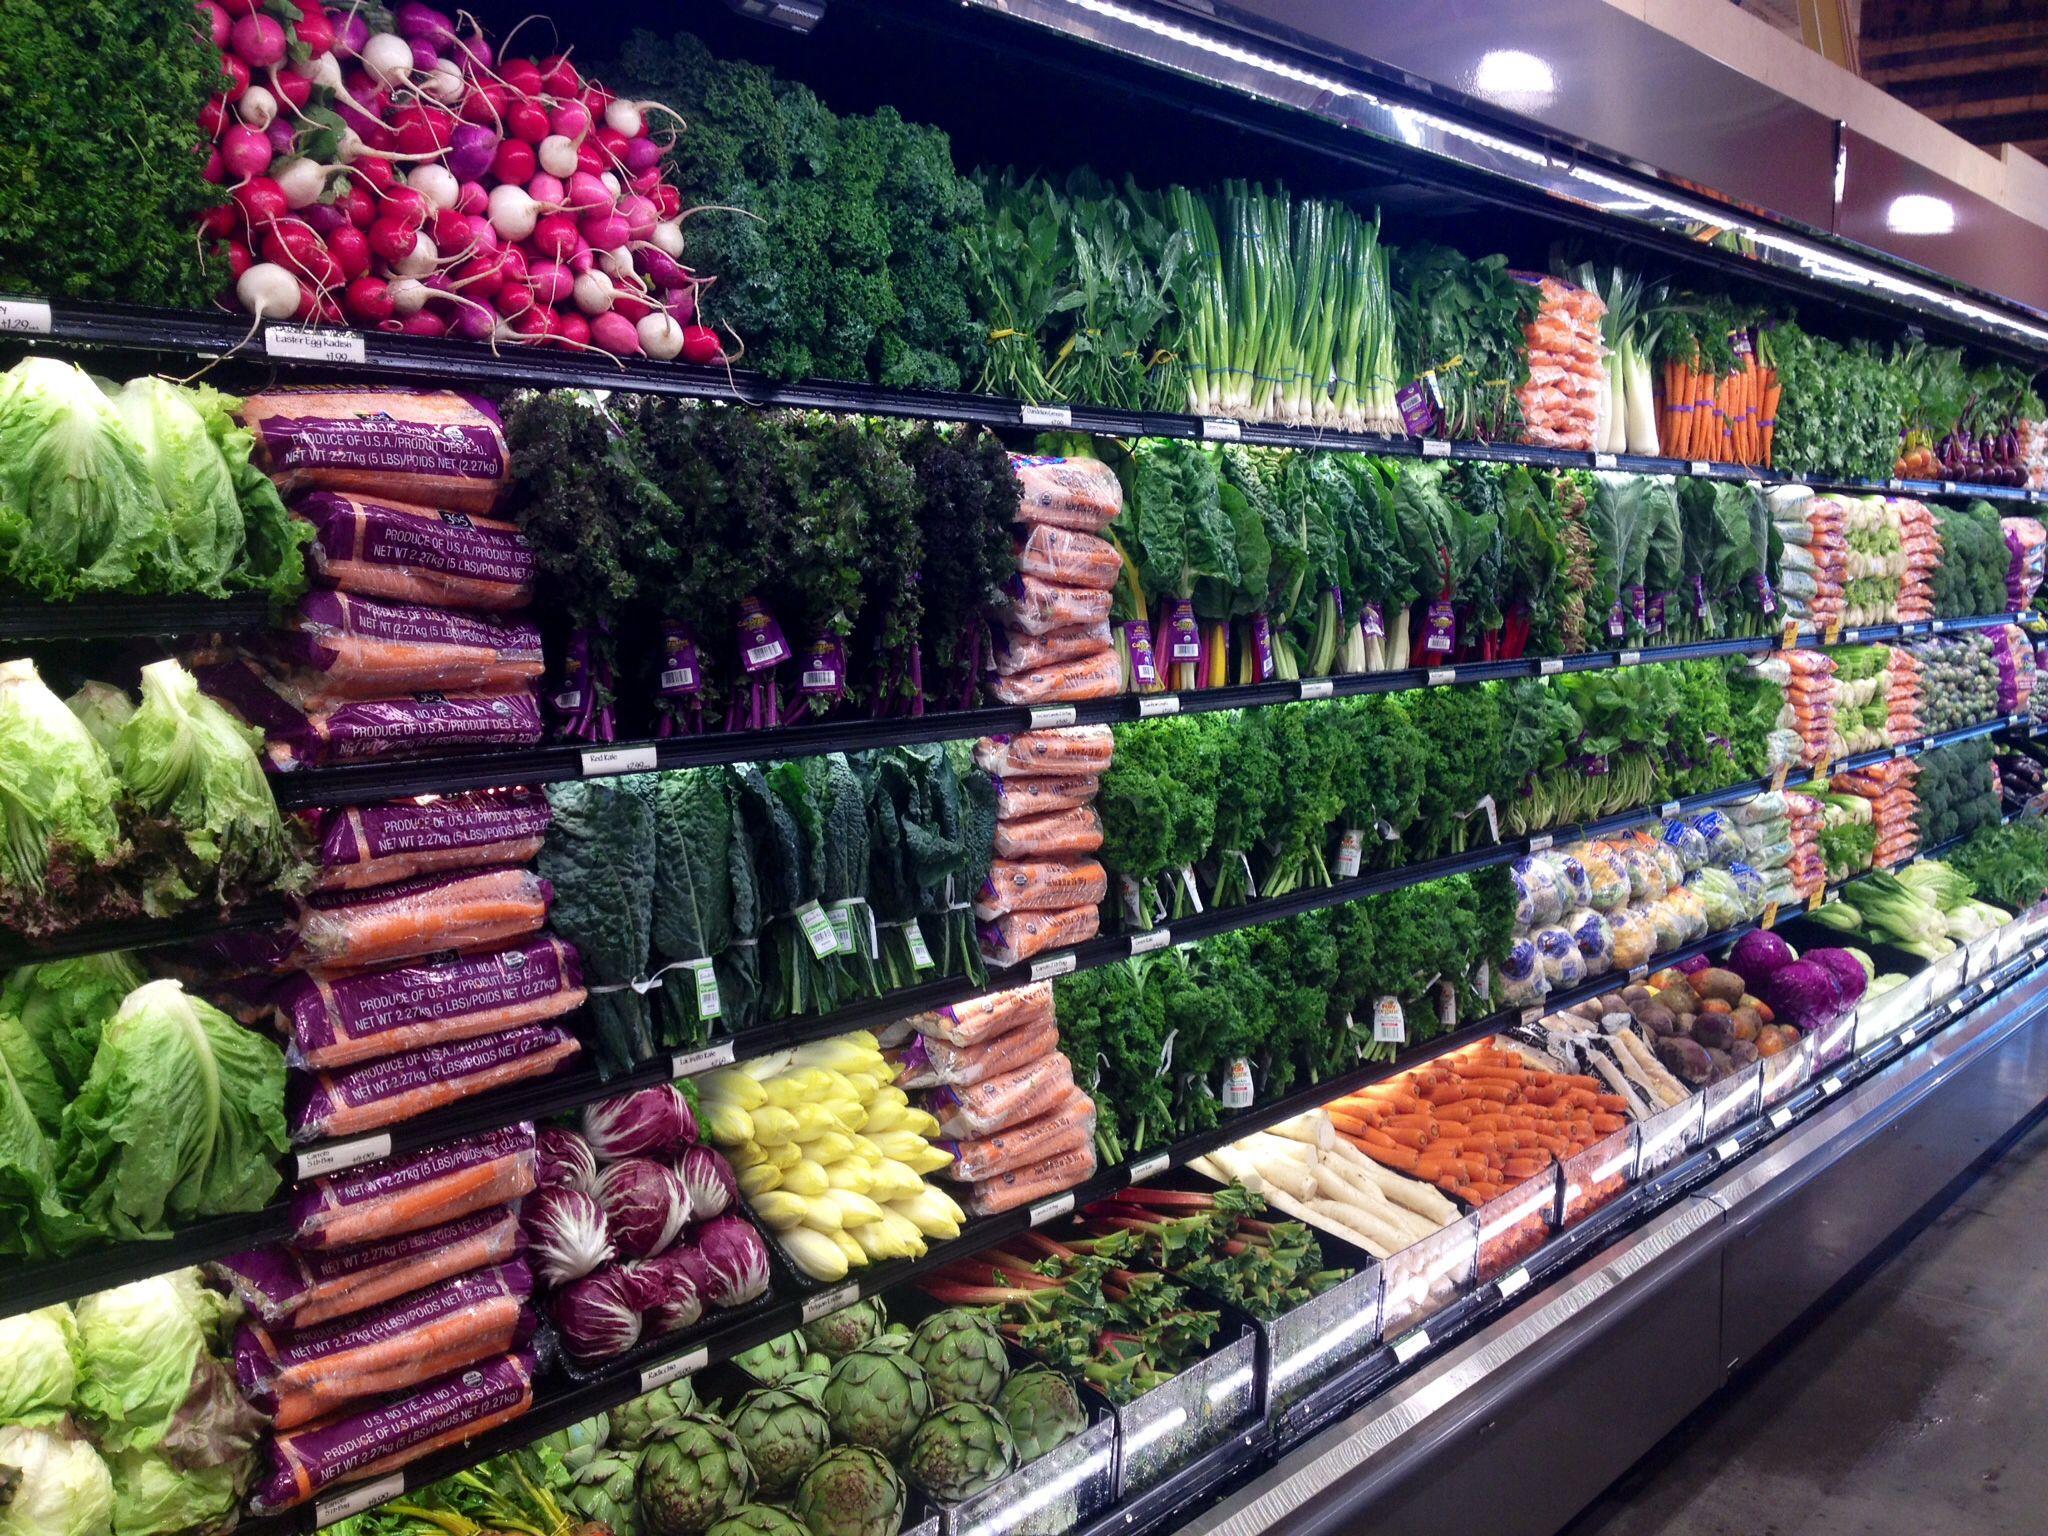 Colleyville TX wet rack greens | Produce display